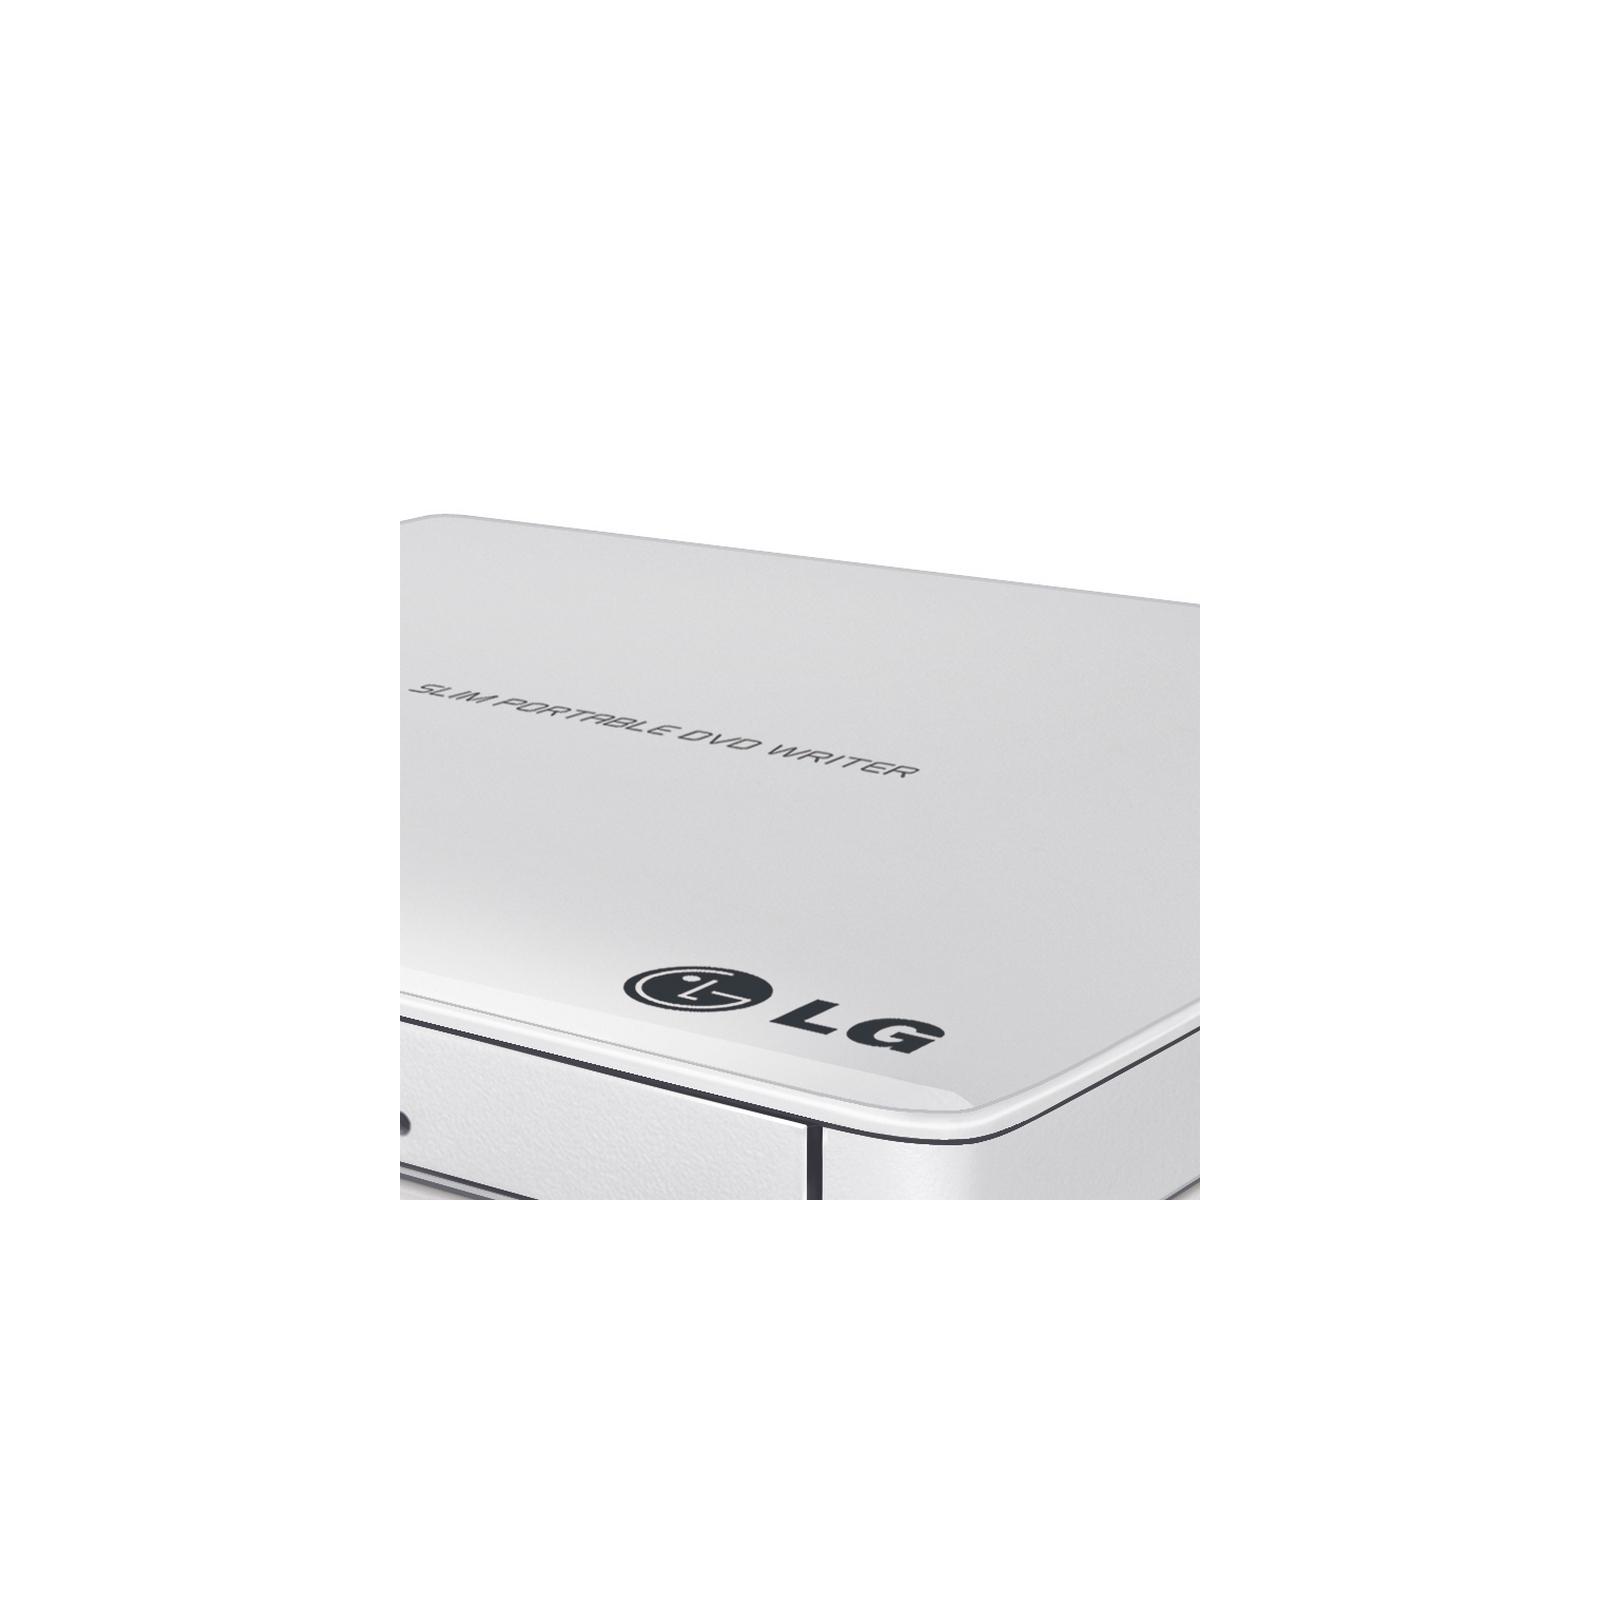 Оптический привод DVD±RW LG ODD GP57EW40 изображение 5